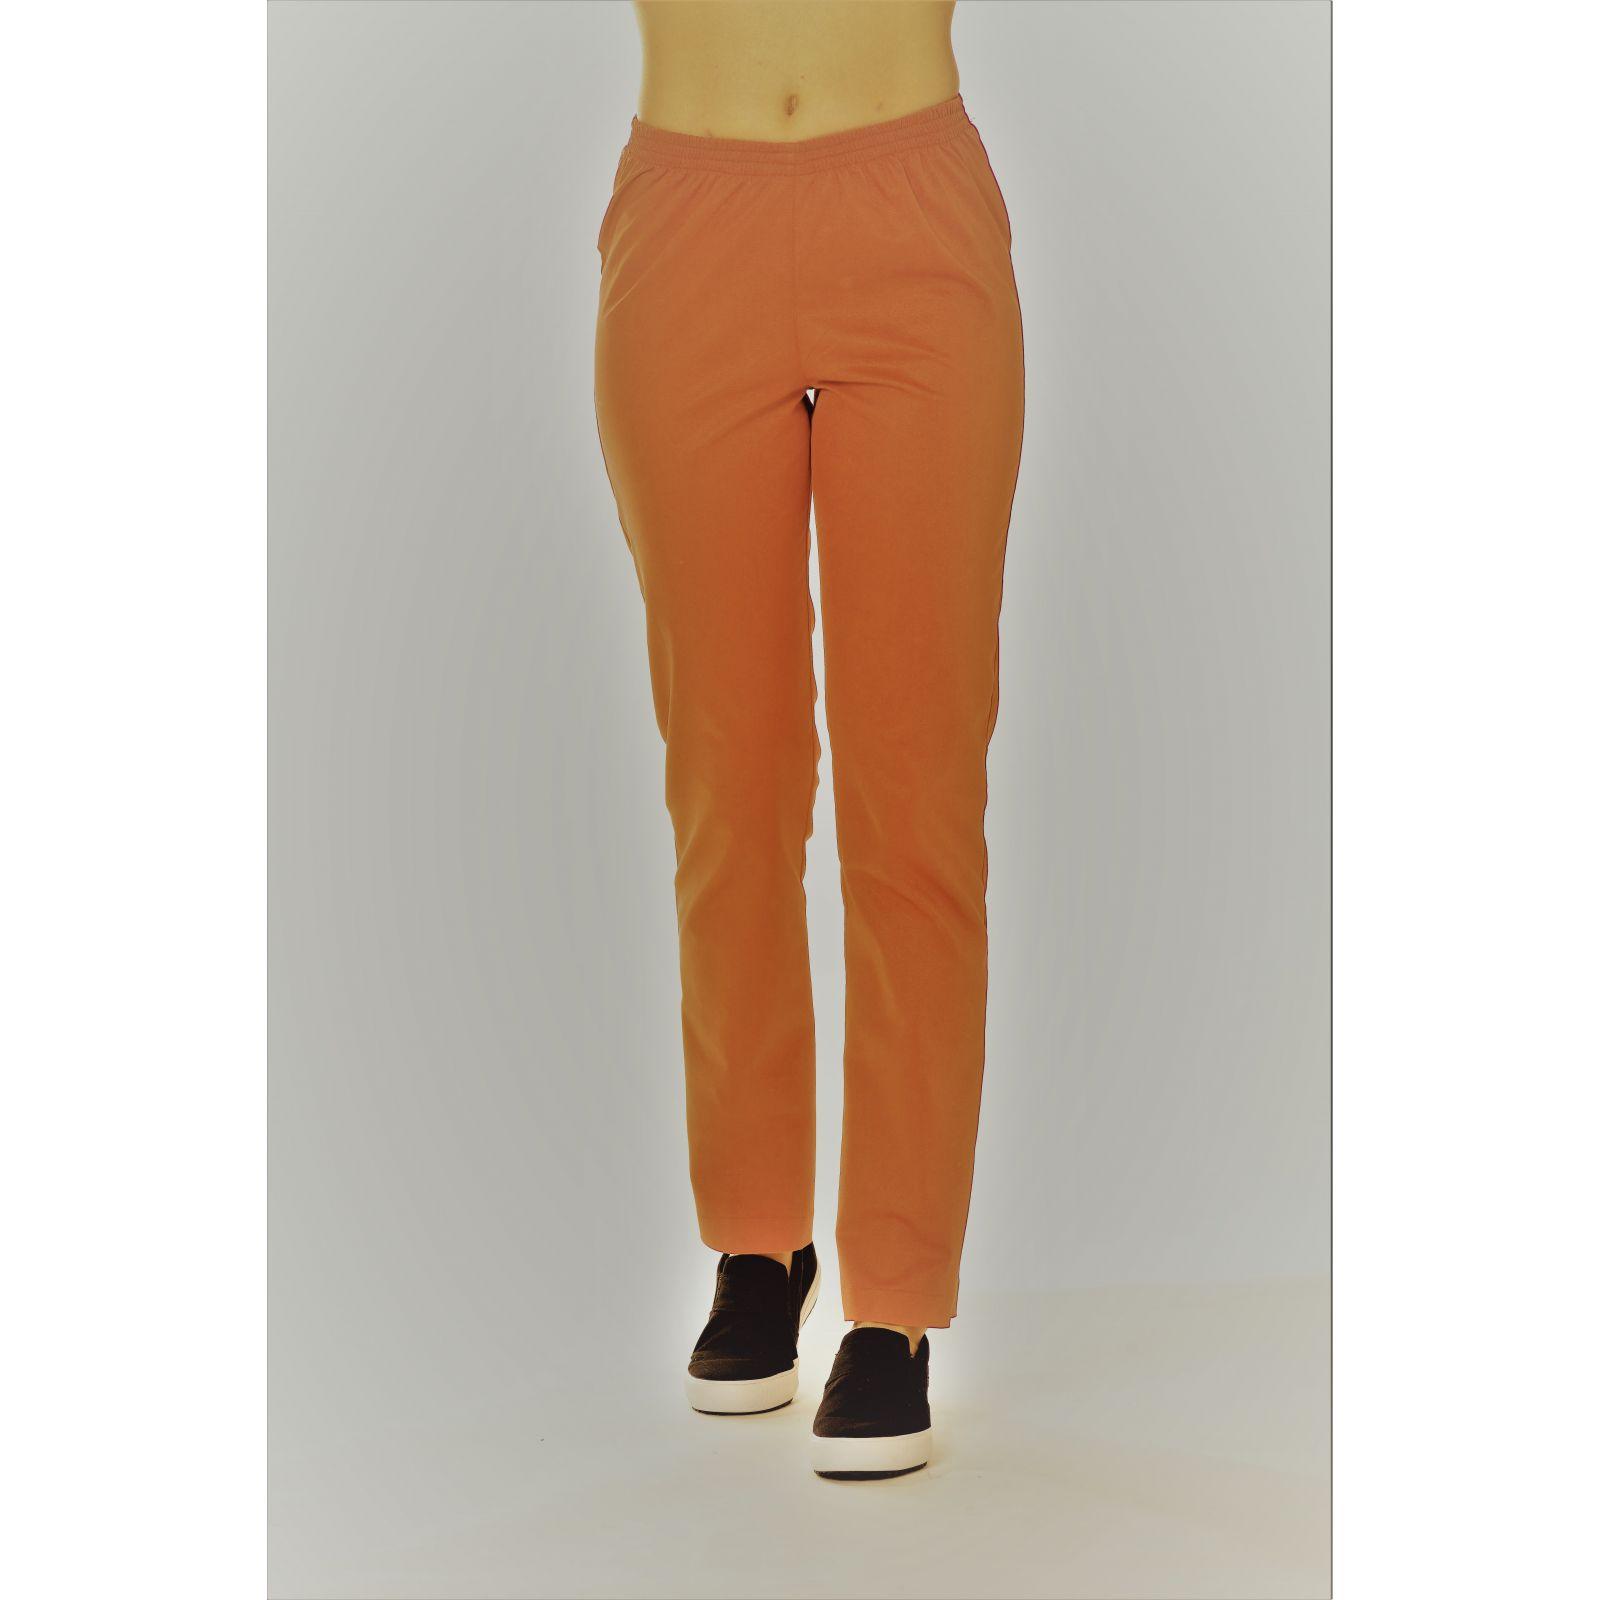 Pantalon unisexe élastique Mankaïa Factory, ancien tissu (051)